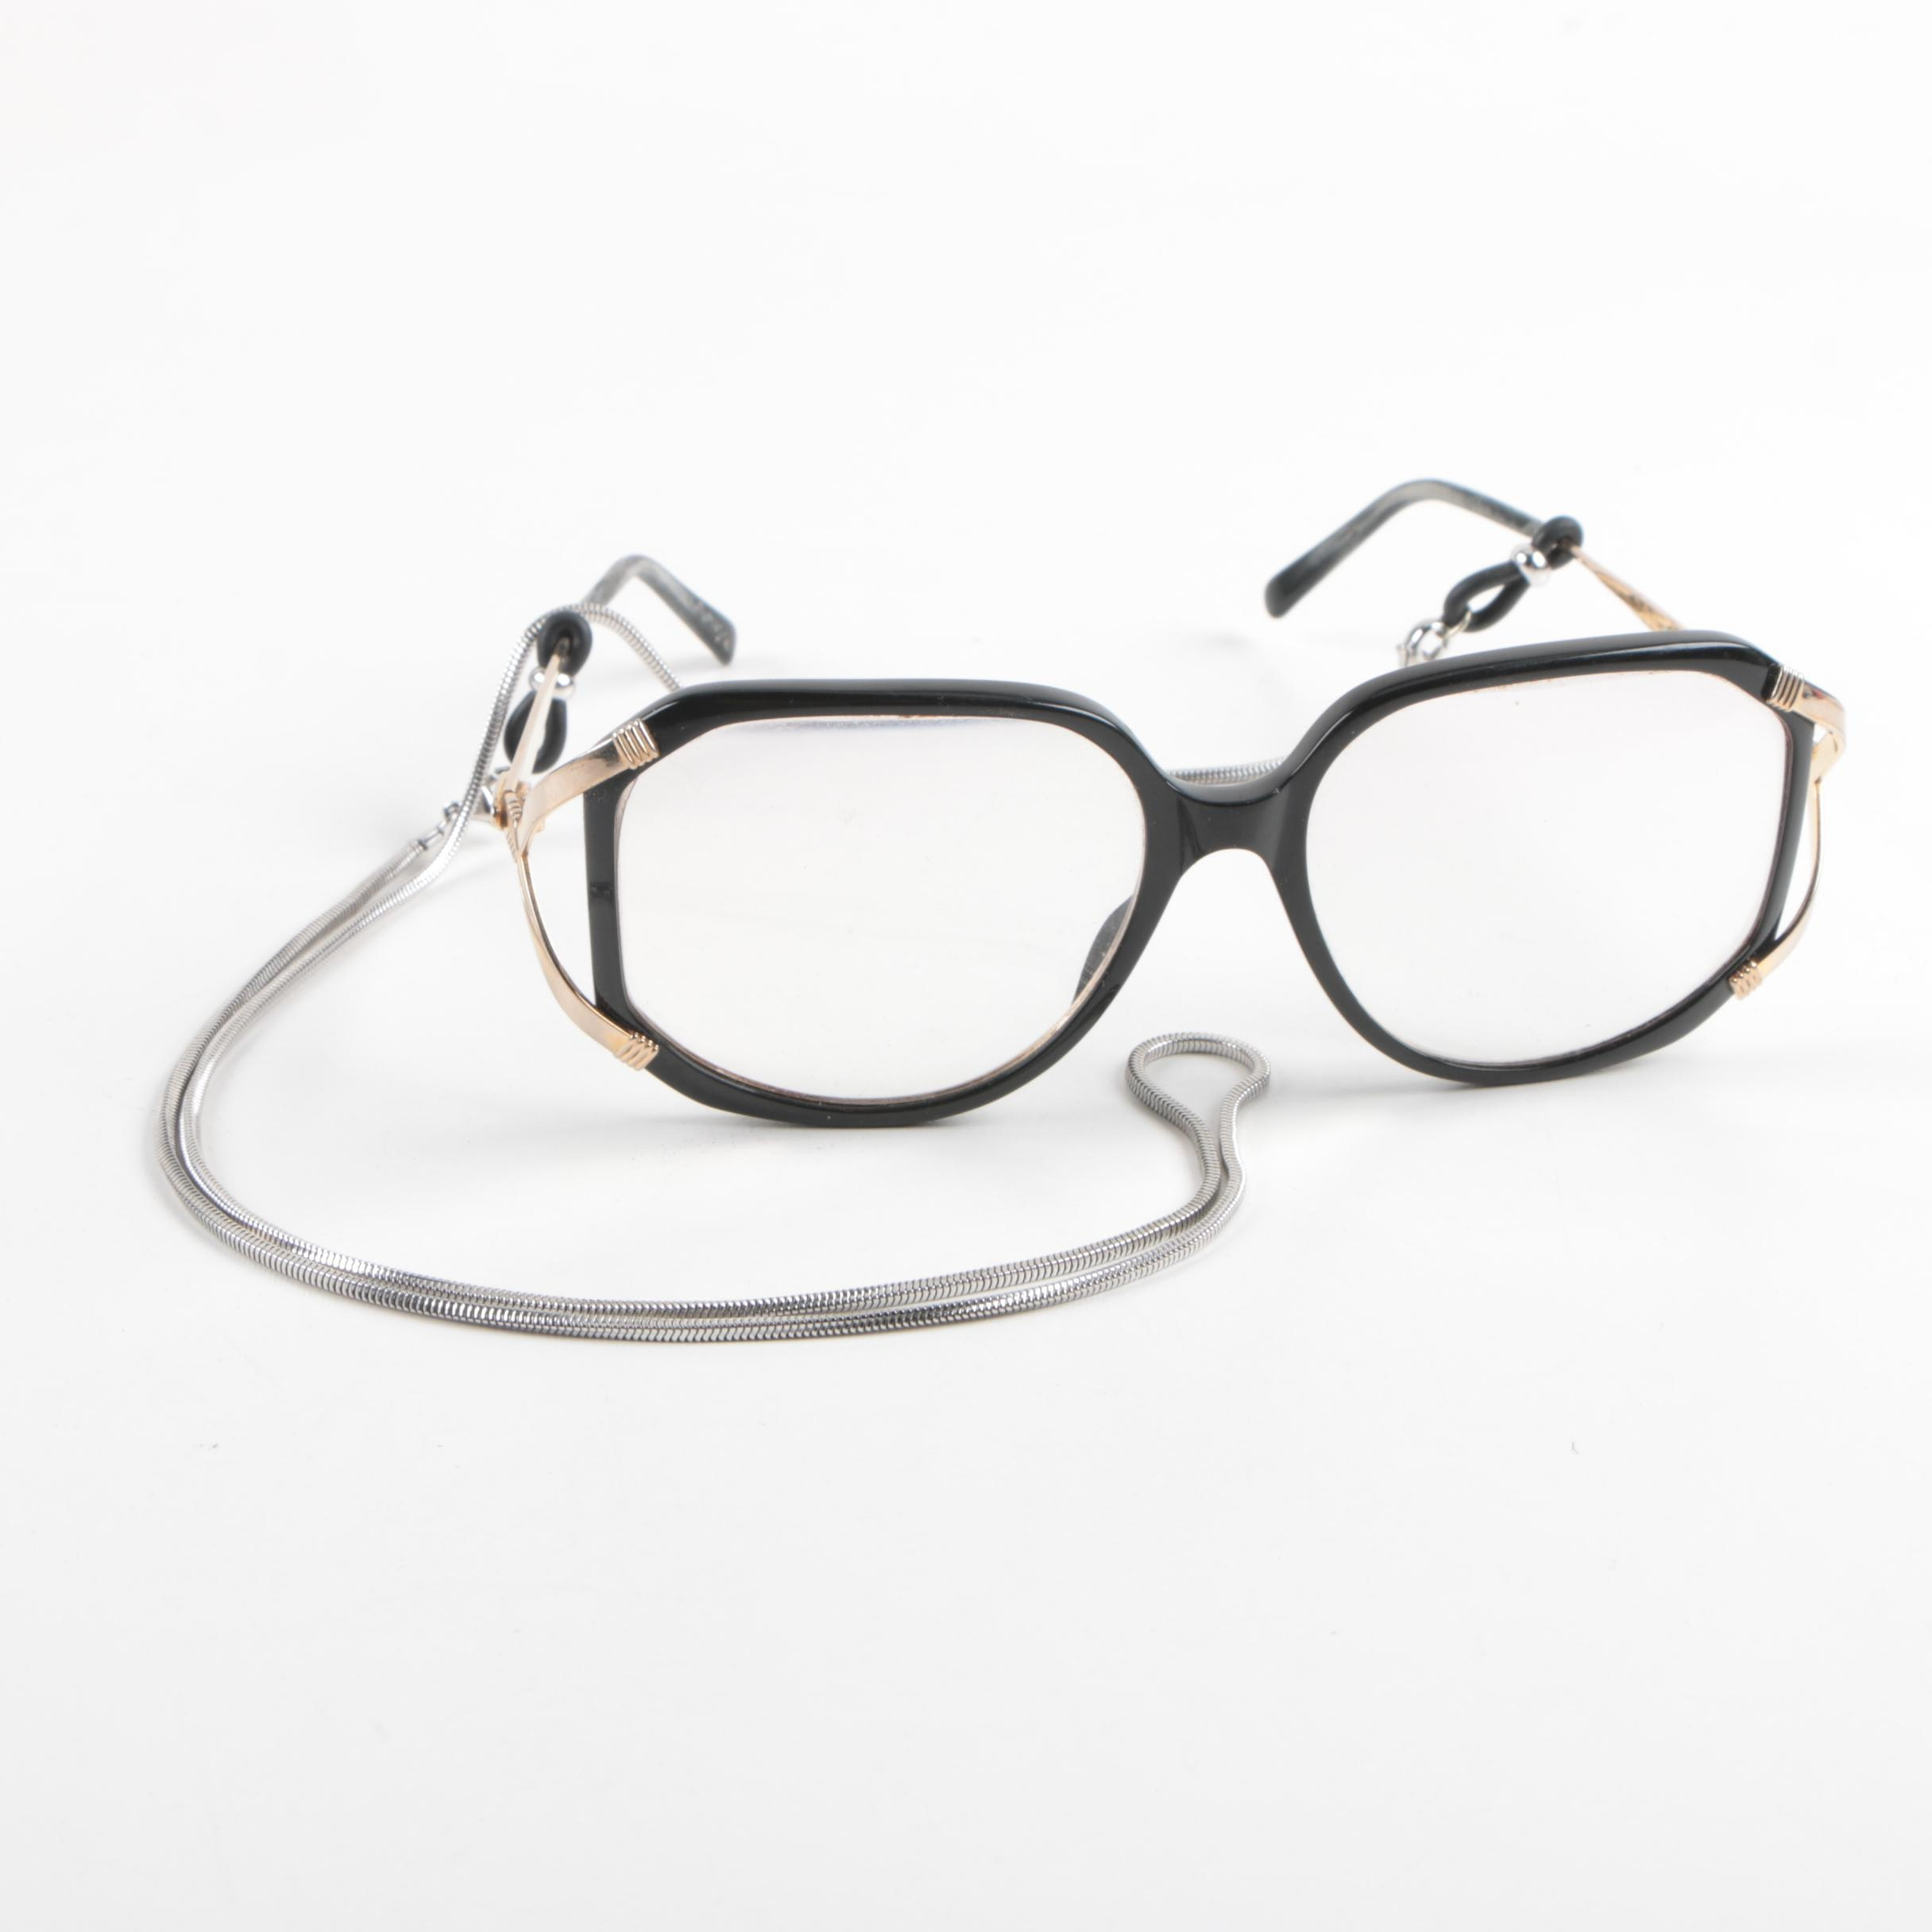 Vintage Christian Dior 2690 Prescription Eyeglasses